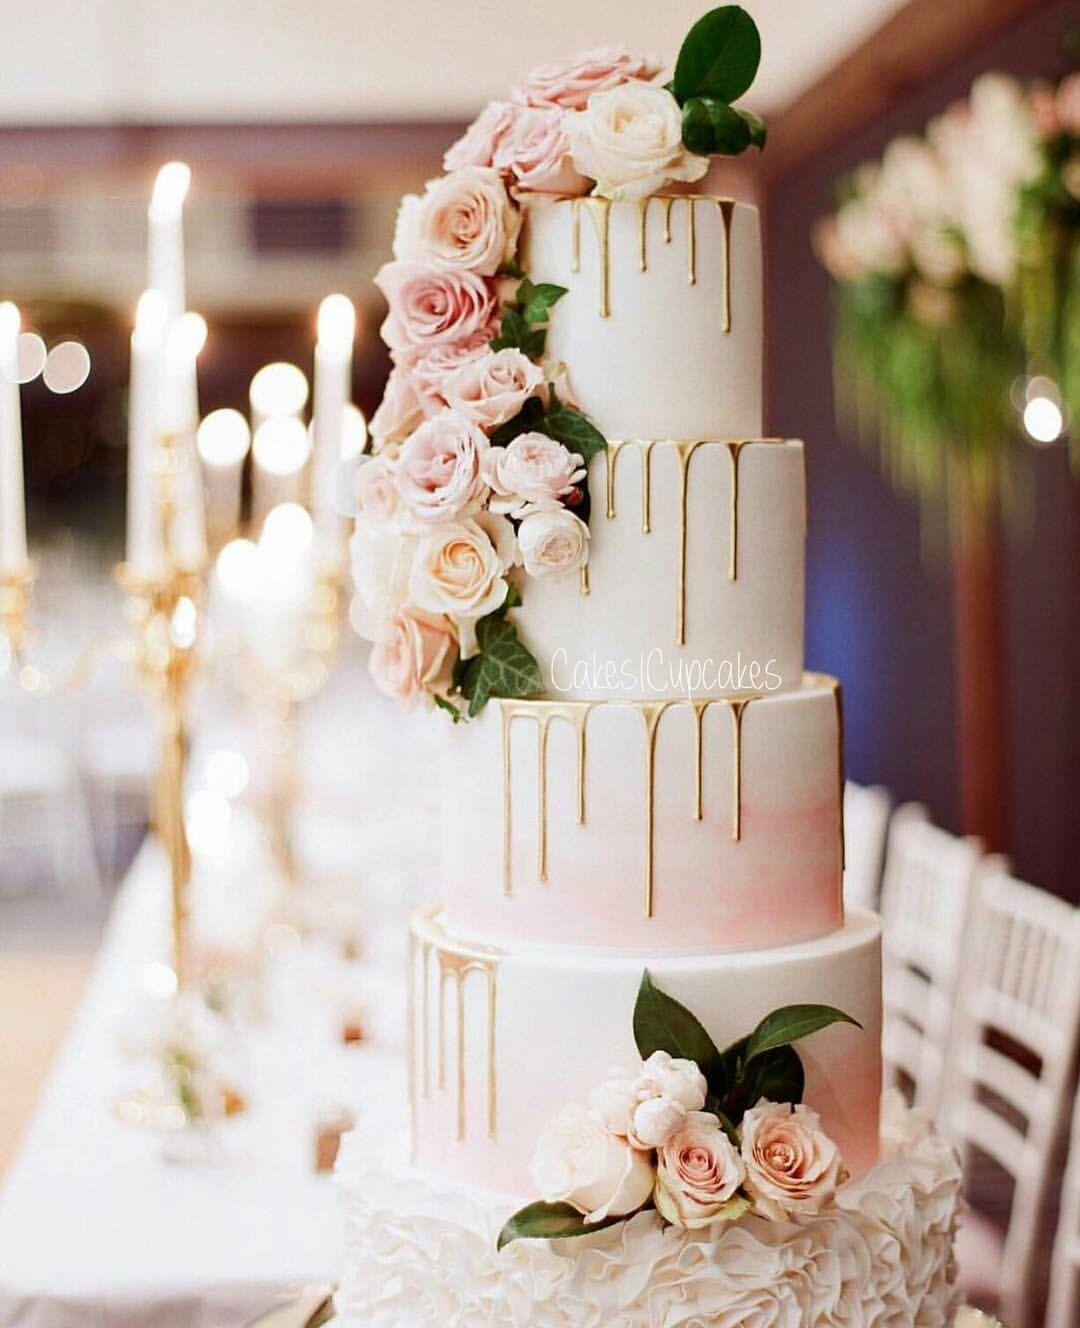 Pin by Terri Faucett on Wedding Cake & Setup | Pinterest